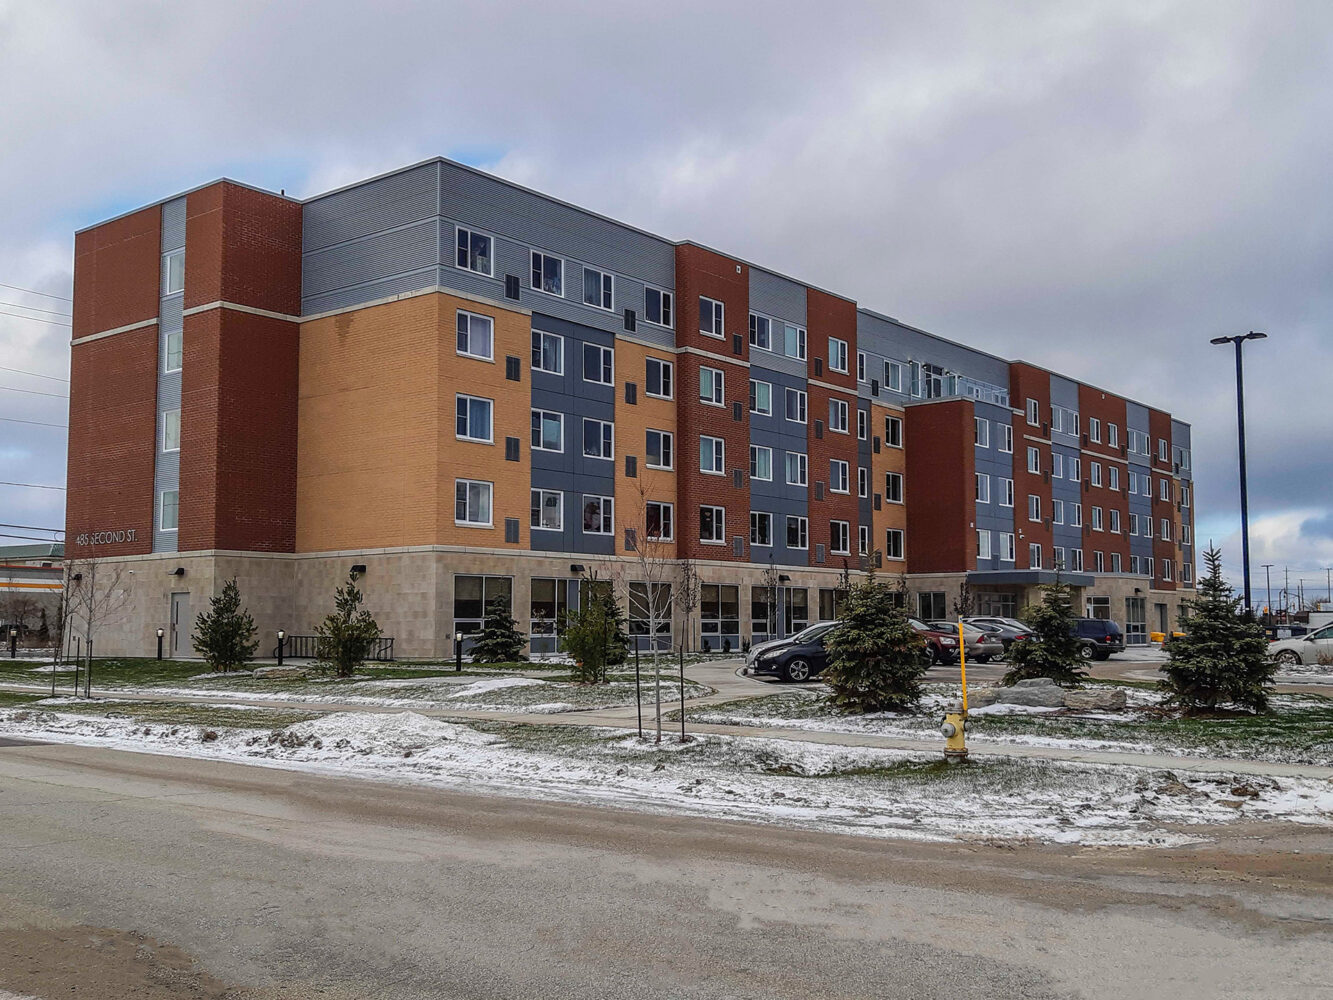 Simcoe County Housing Corporation